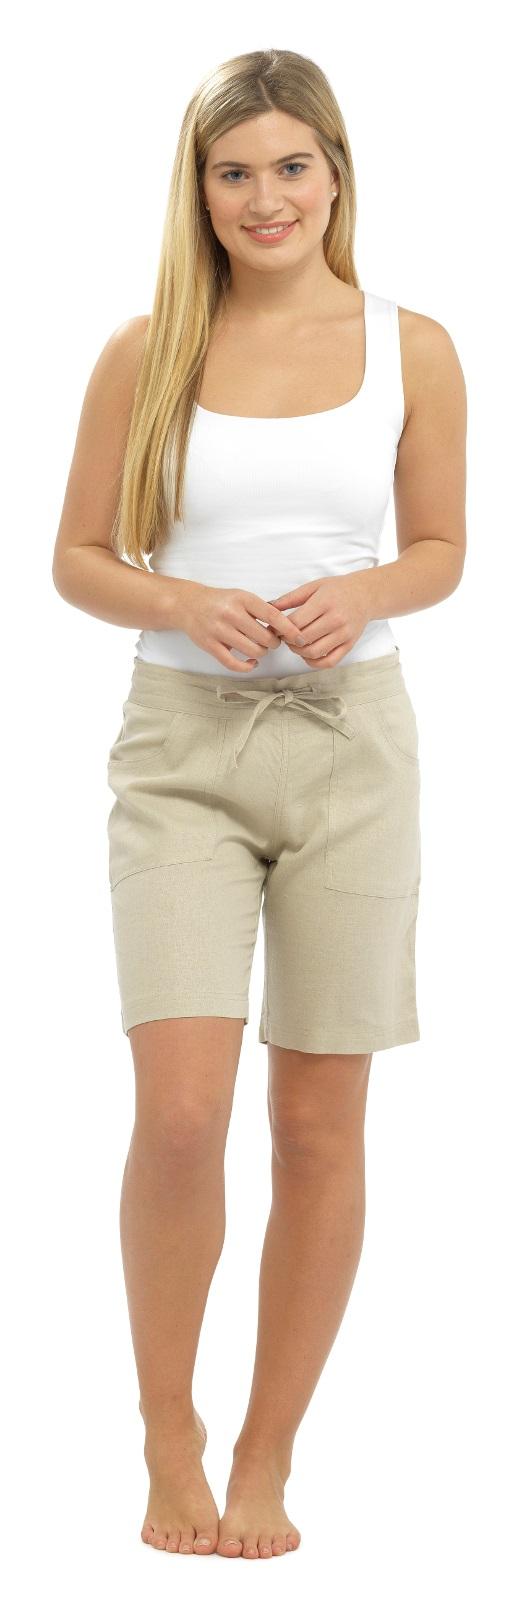 29483bb205f773 Womens Linen Shorts With Elasticated Waist Holiday Beach Hot Pants ...